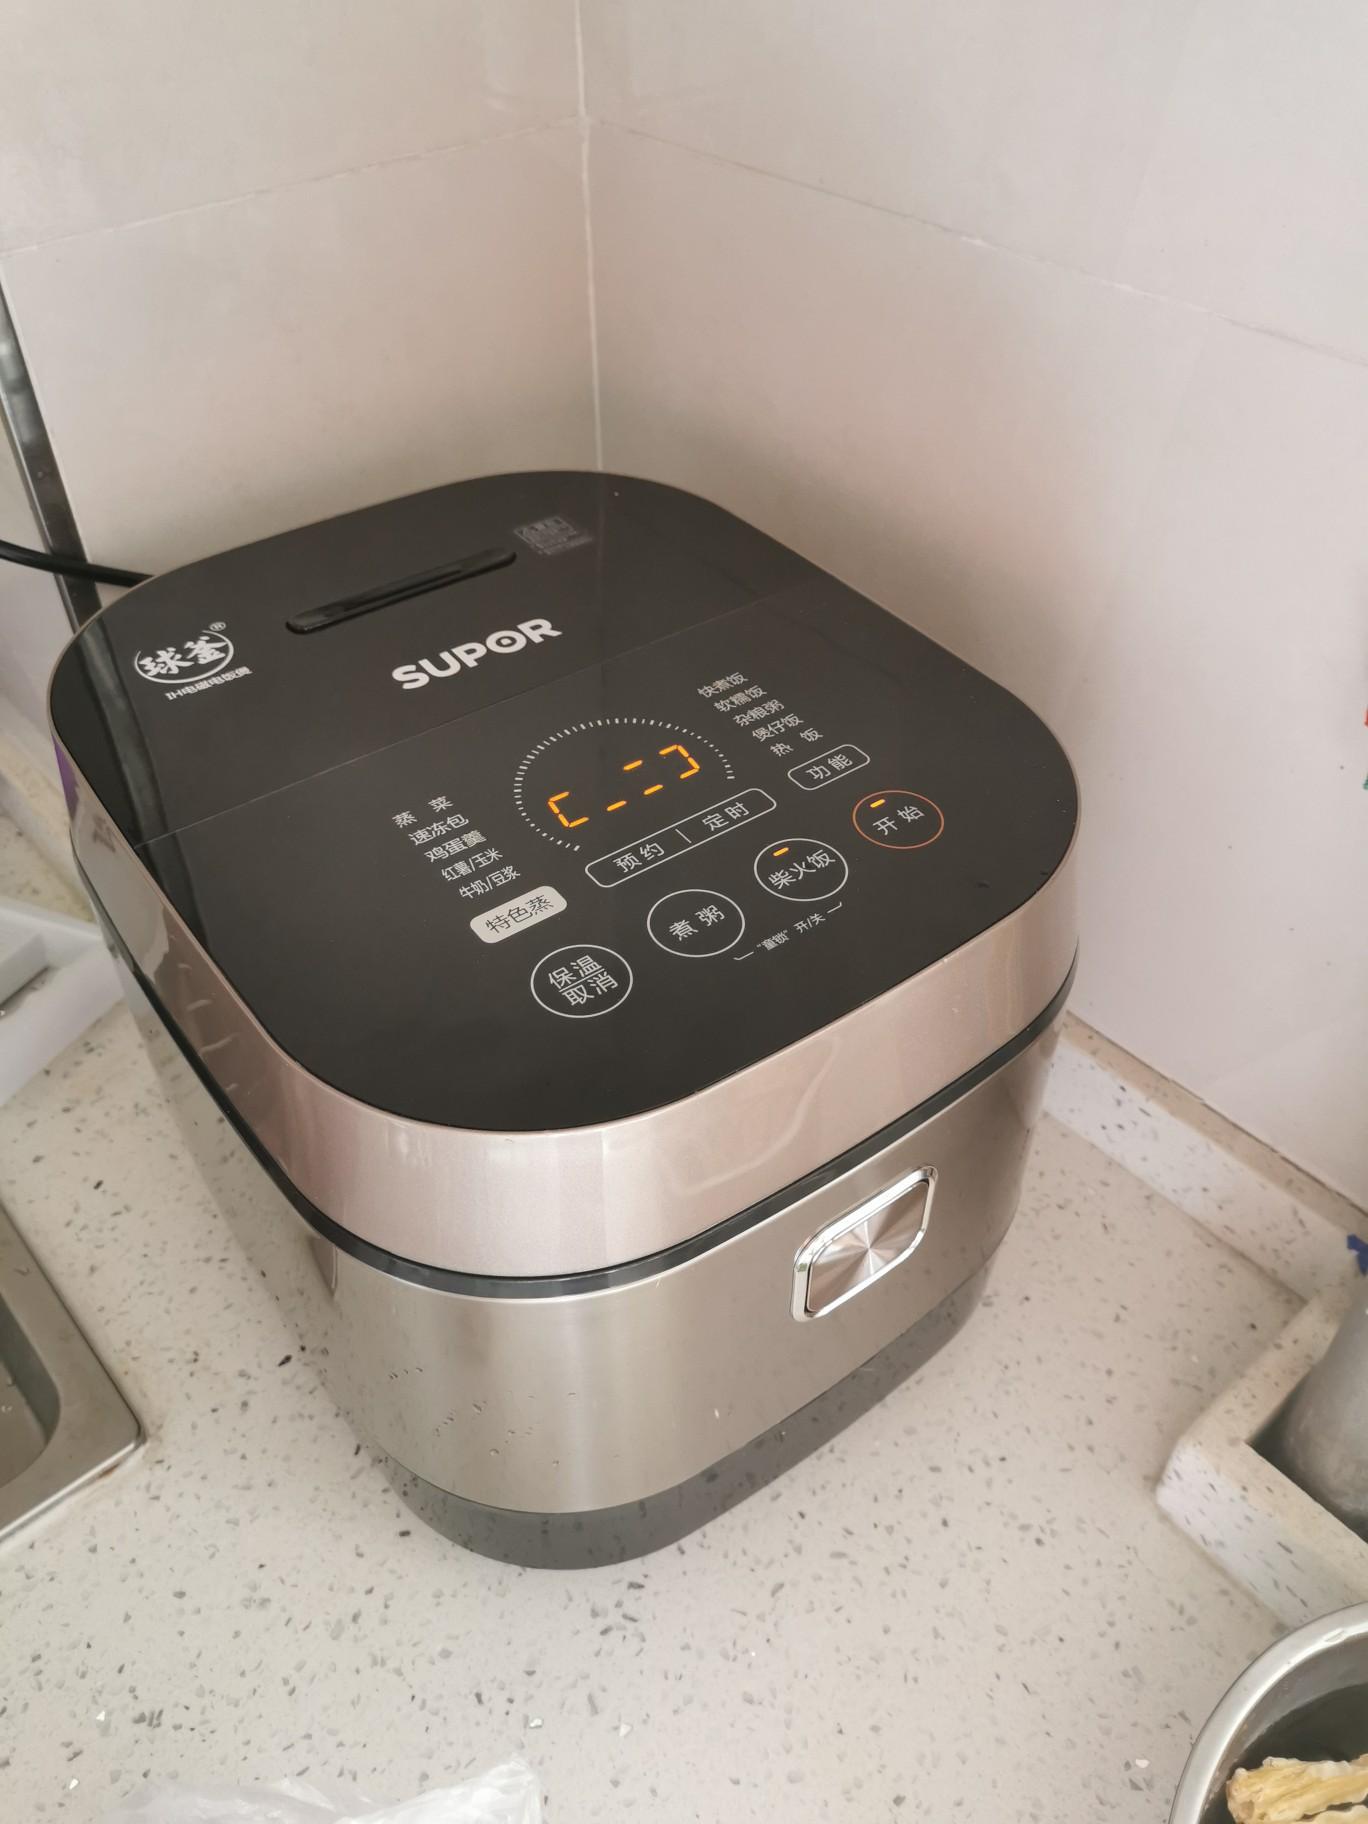 <b>苏泊尔sf50hc750和sf50hc32电饭煲有什么区别?</b>